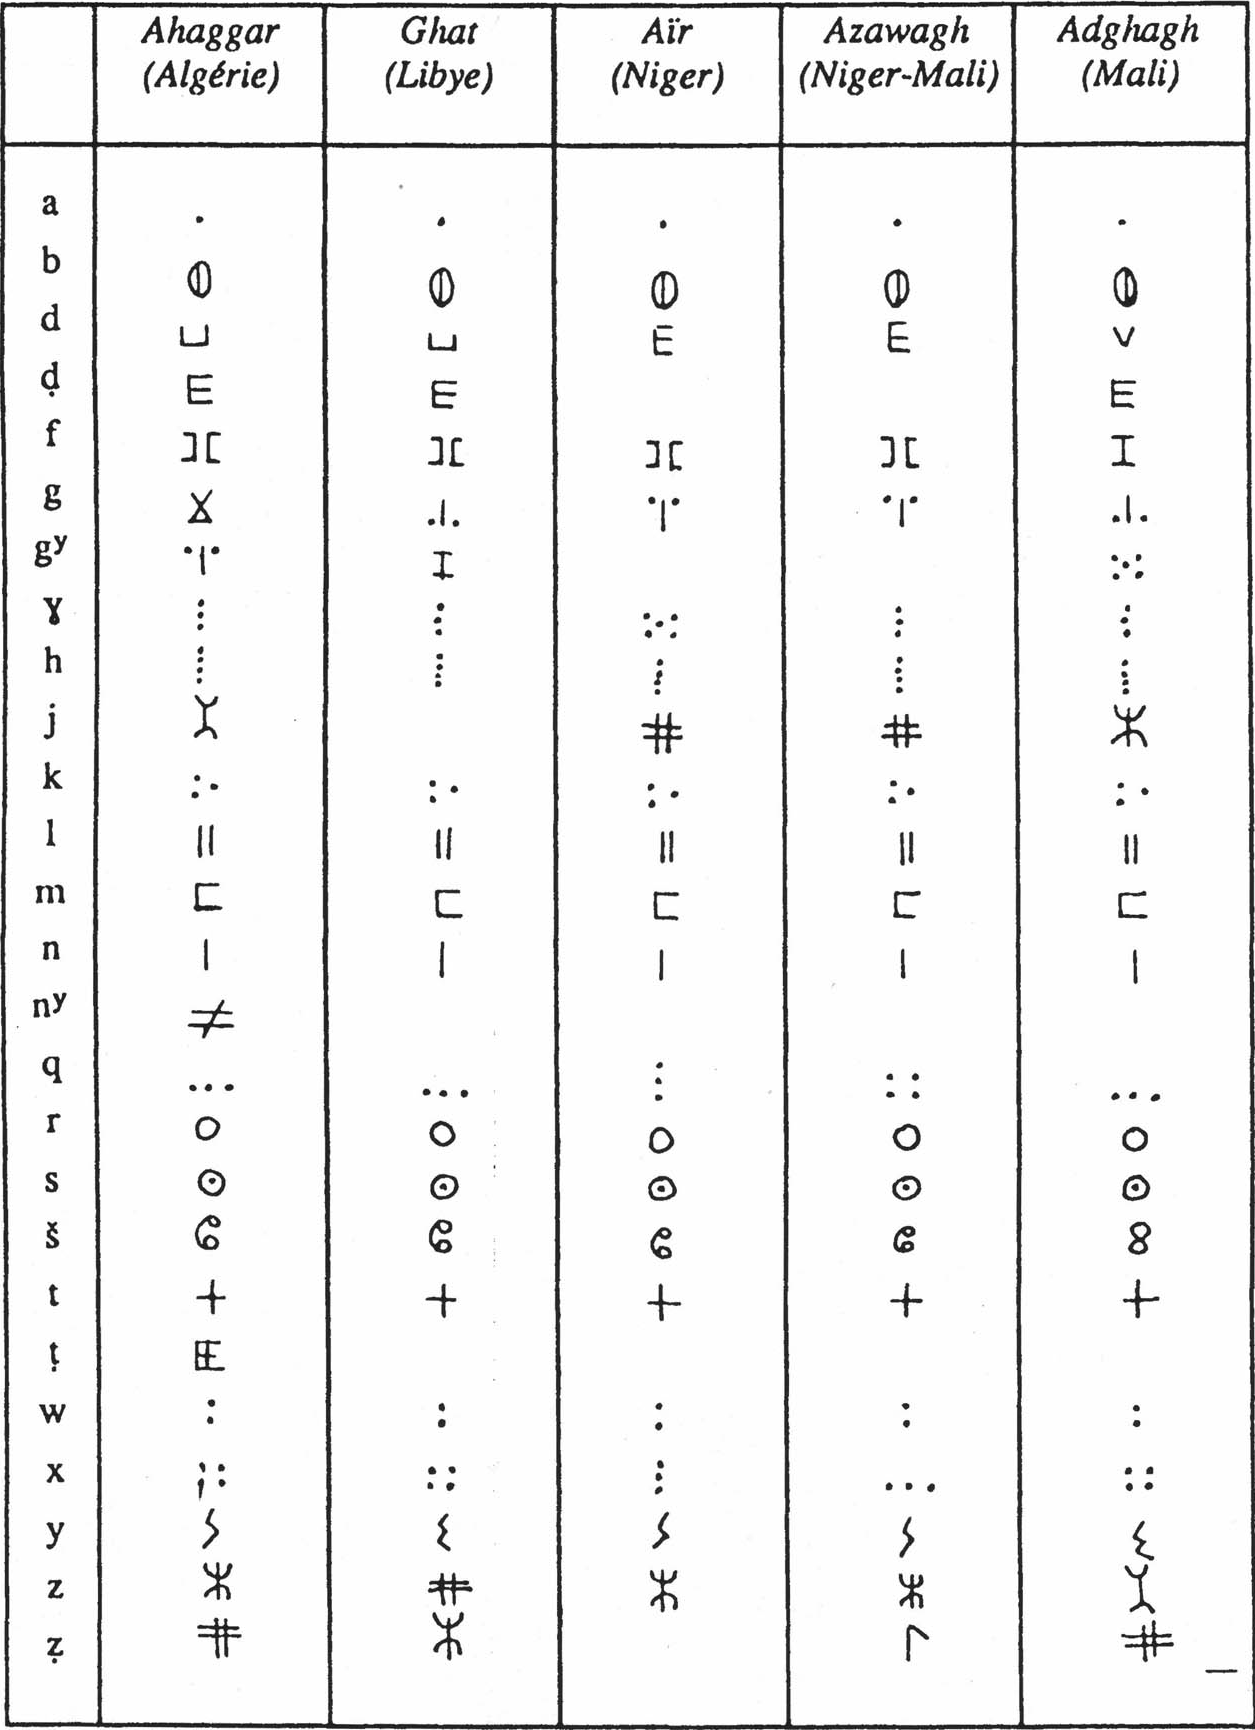 17 Douiret Eropaei Ecriture G Camps H Claudot Hawad S